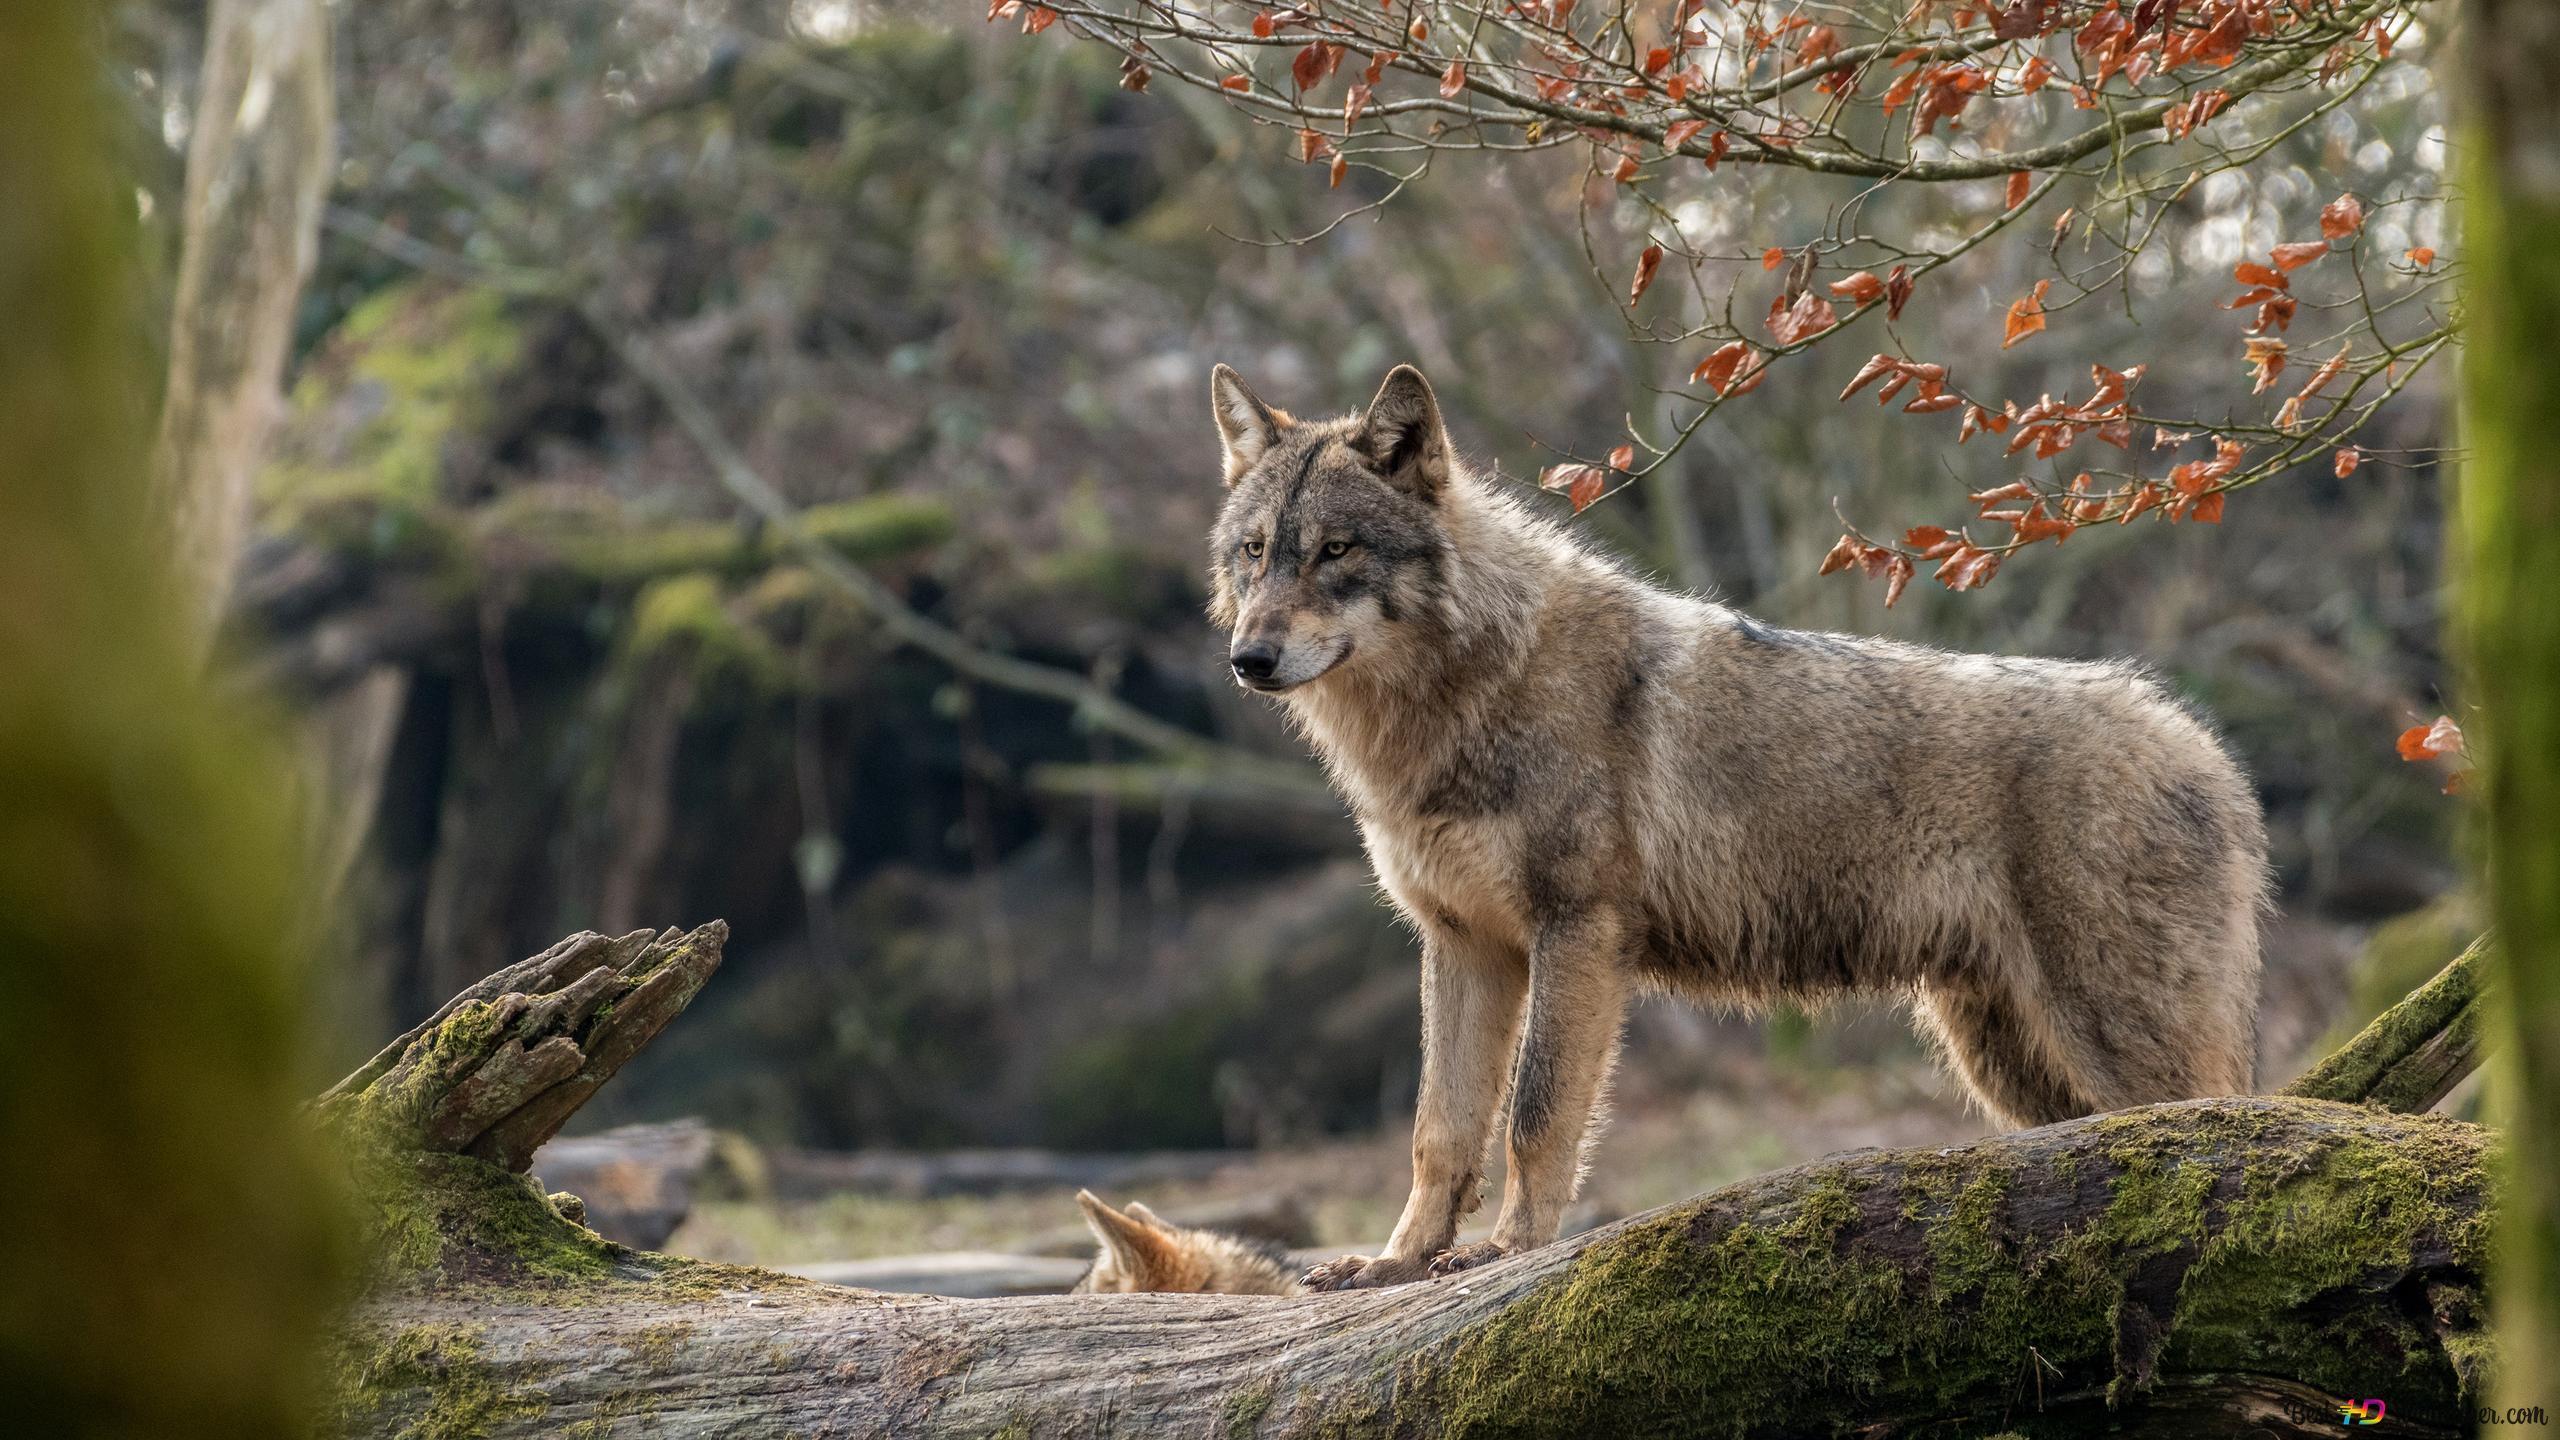 Gray wolf HD wallpaper download